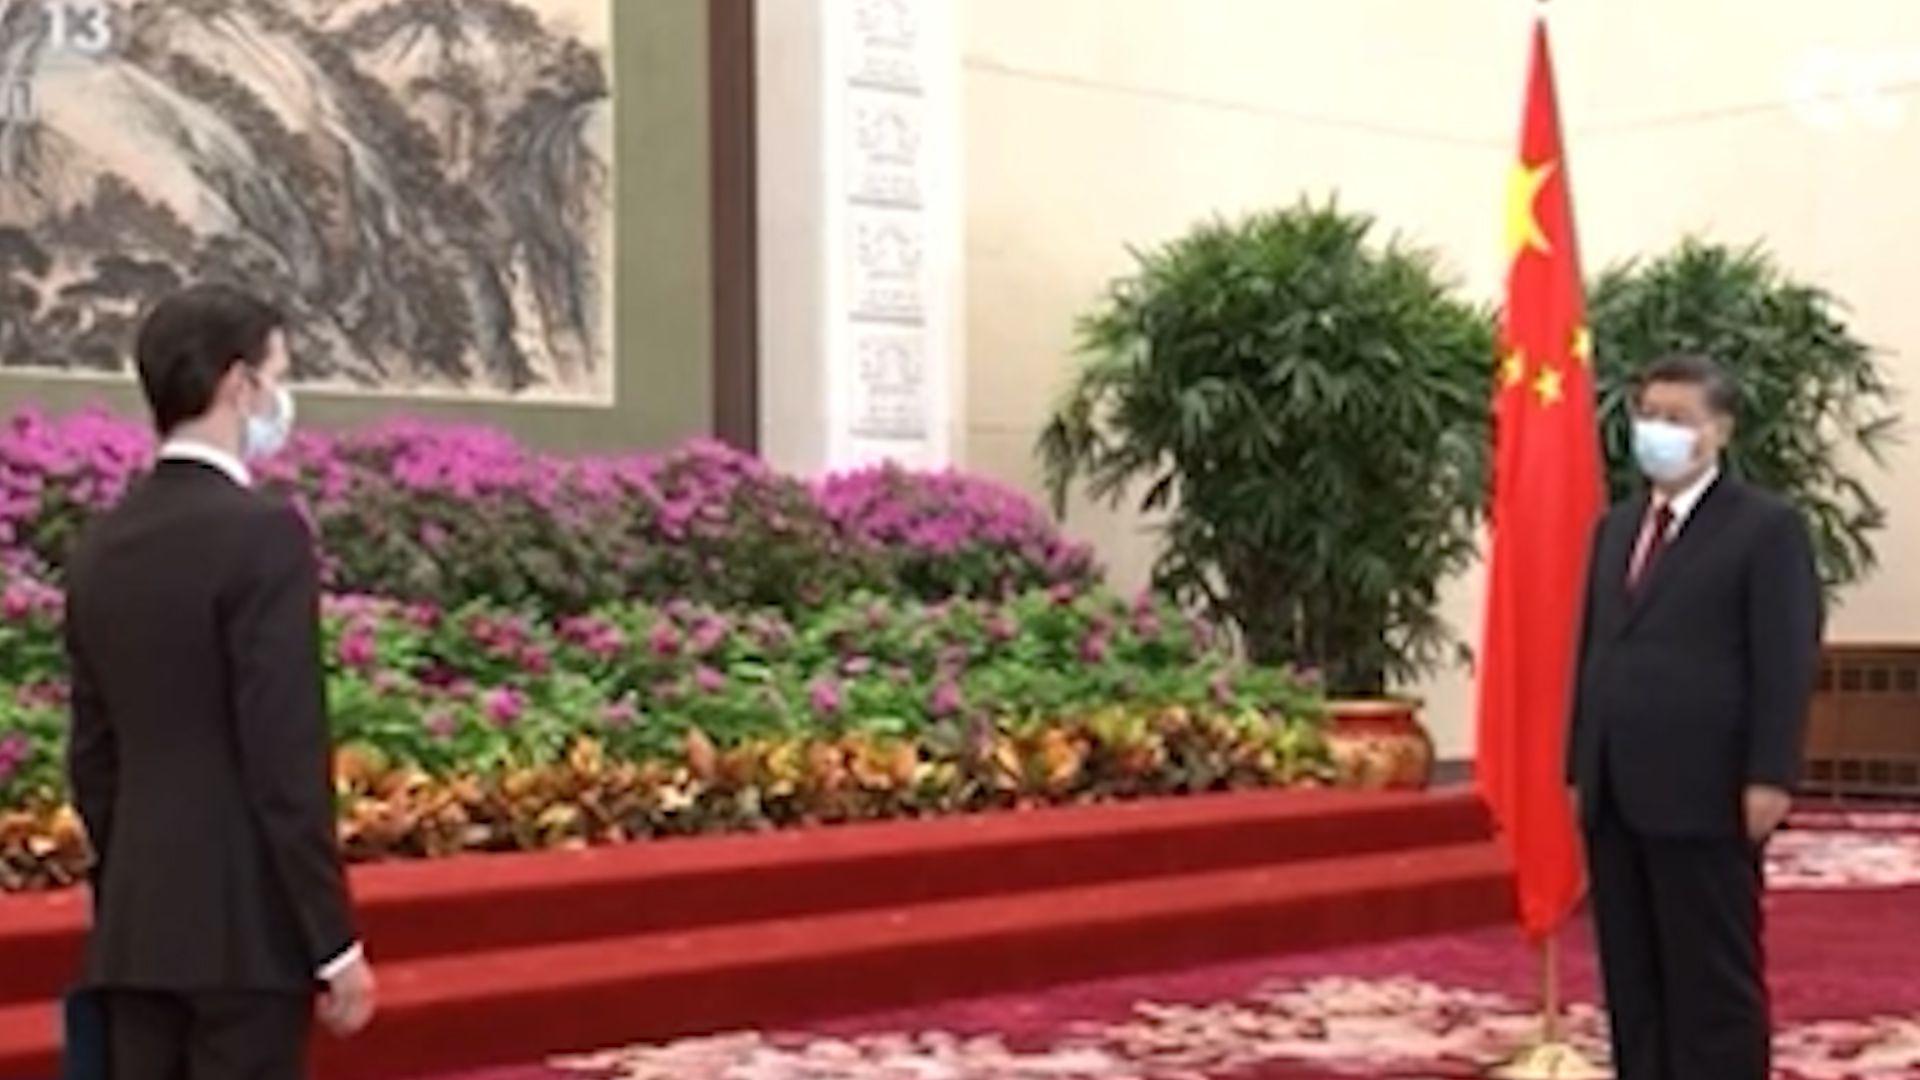 El embajador argentino en China, Sabino Vaca Narvaja junto a Xi Jinping